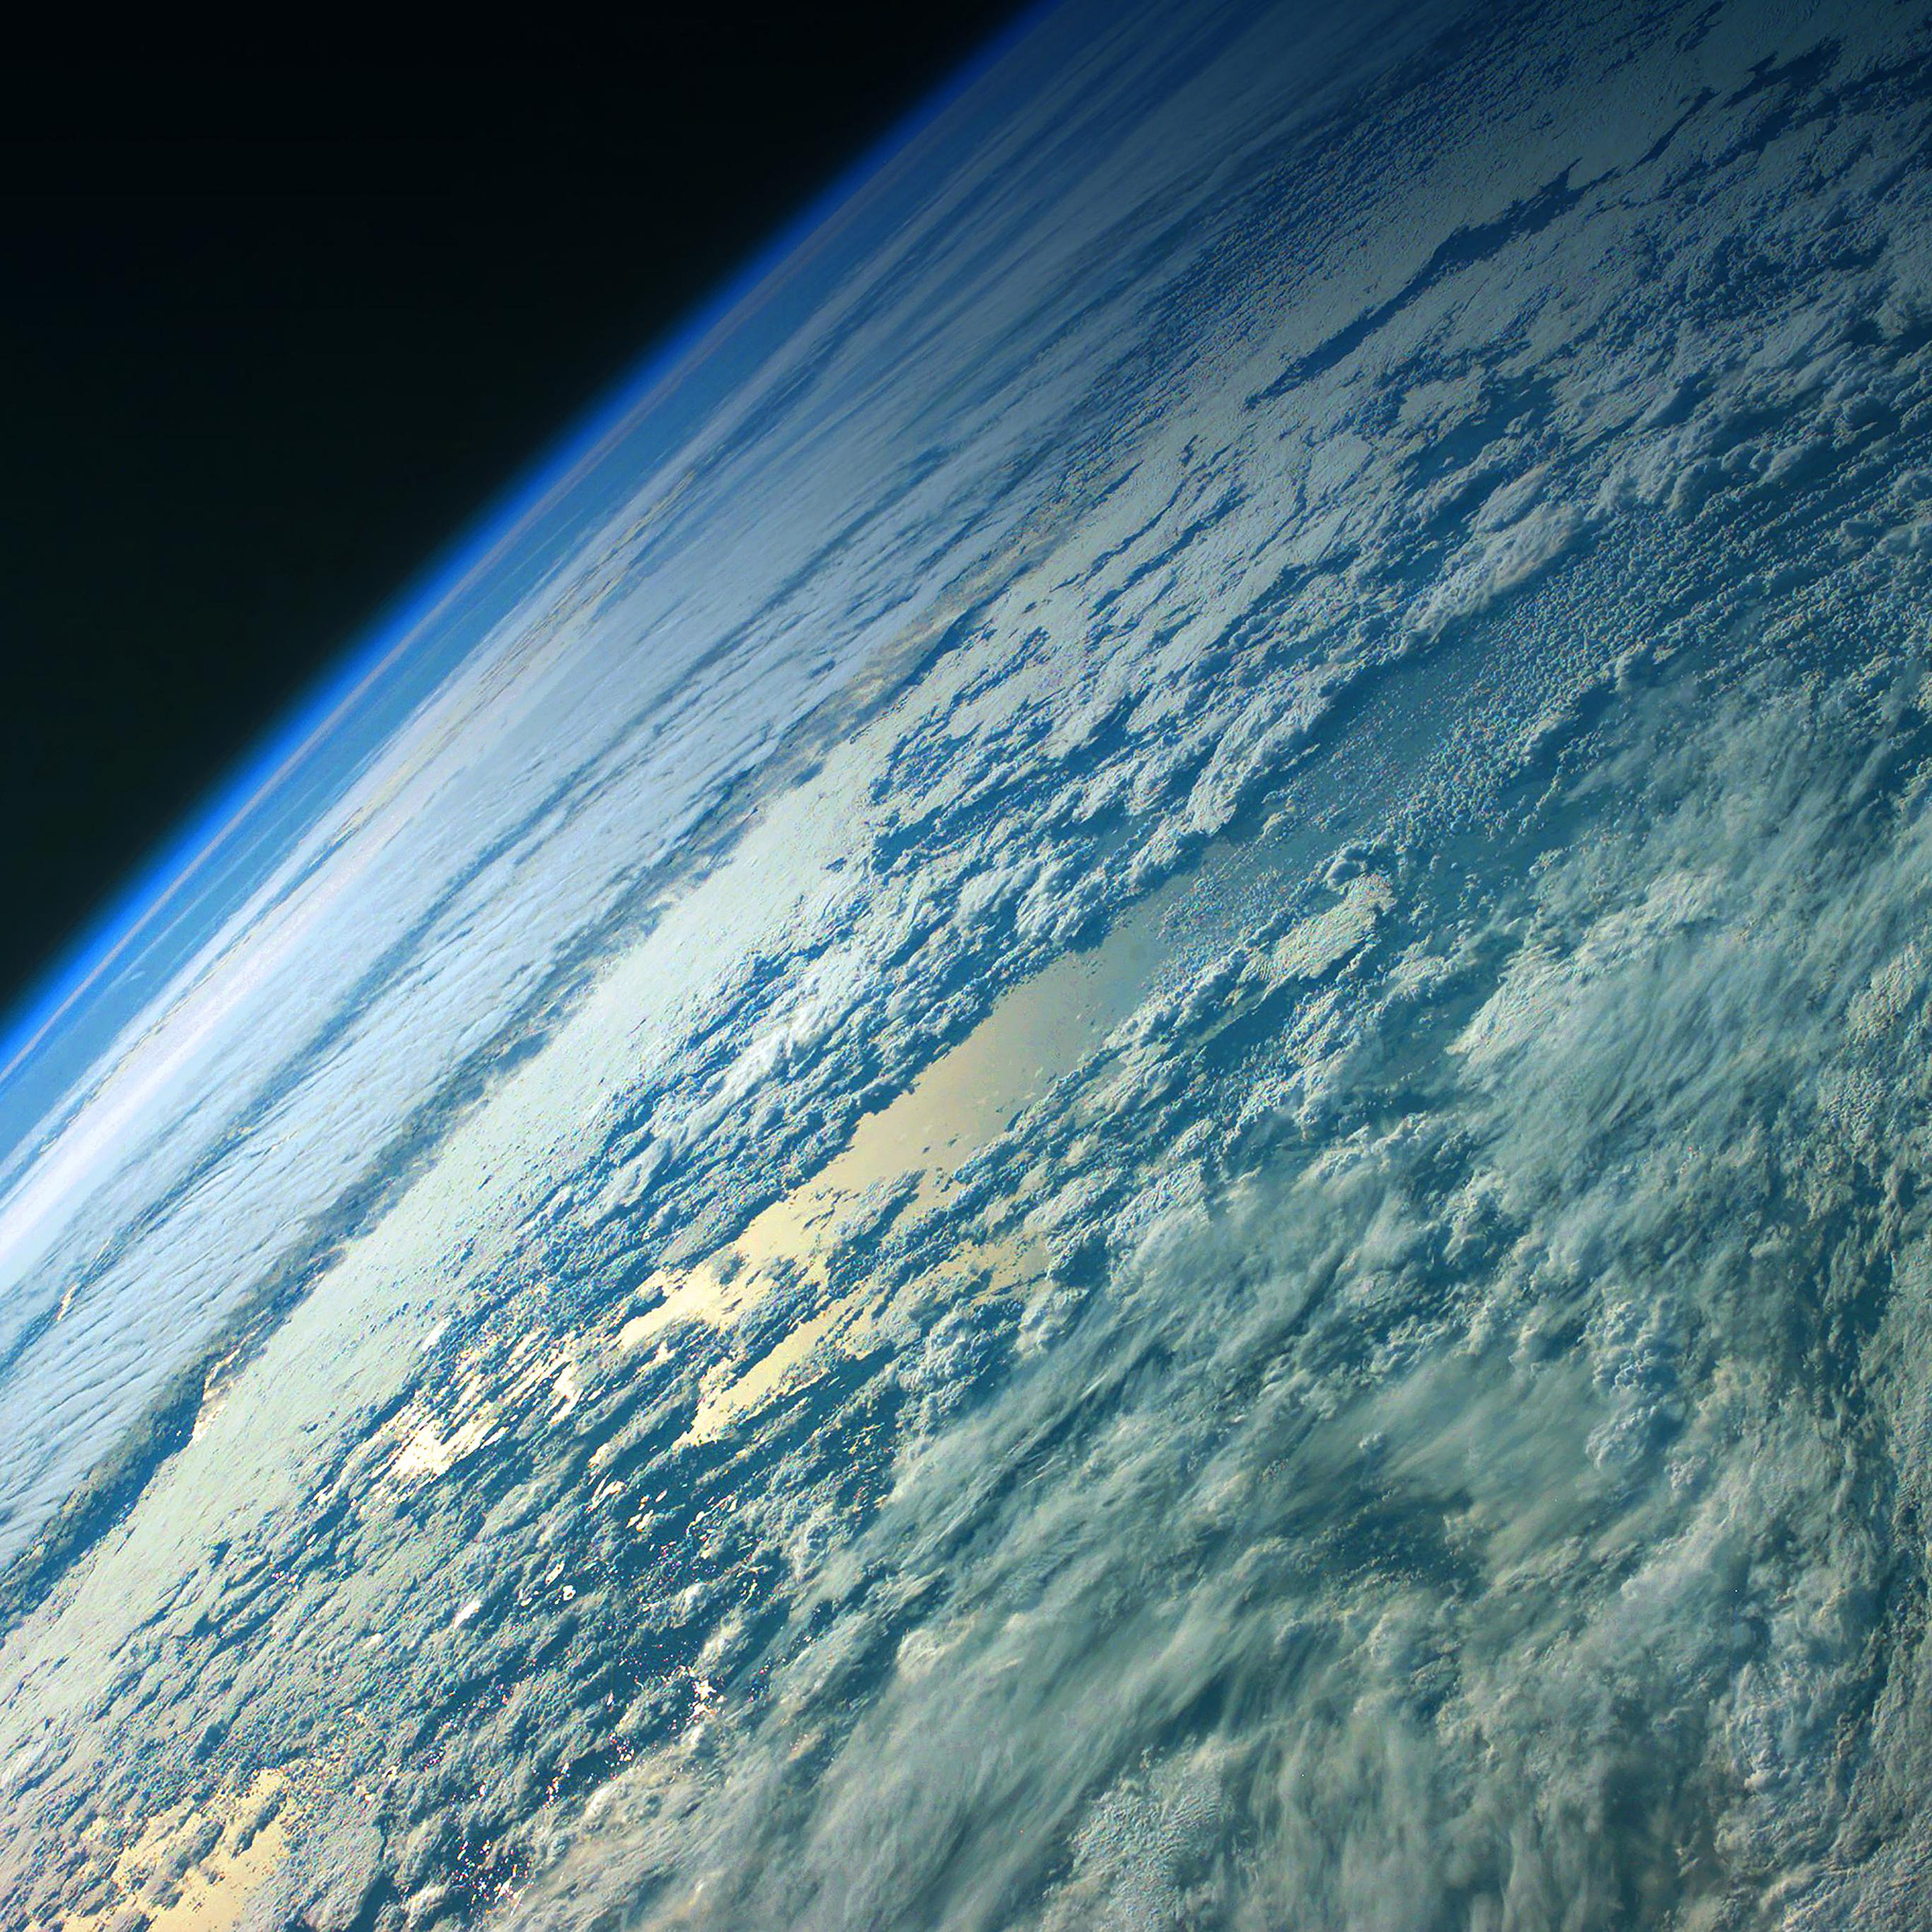 Desktop Wallpaper Earth From Space: Mc03-wallpaper-green-earth-space